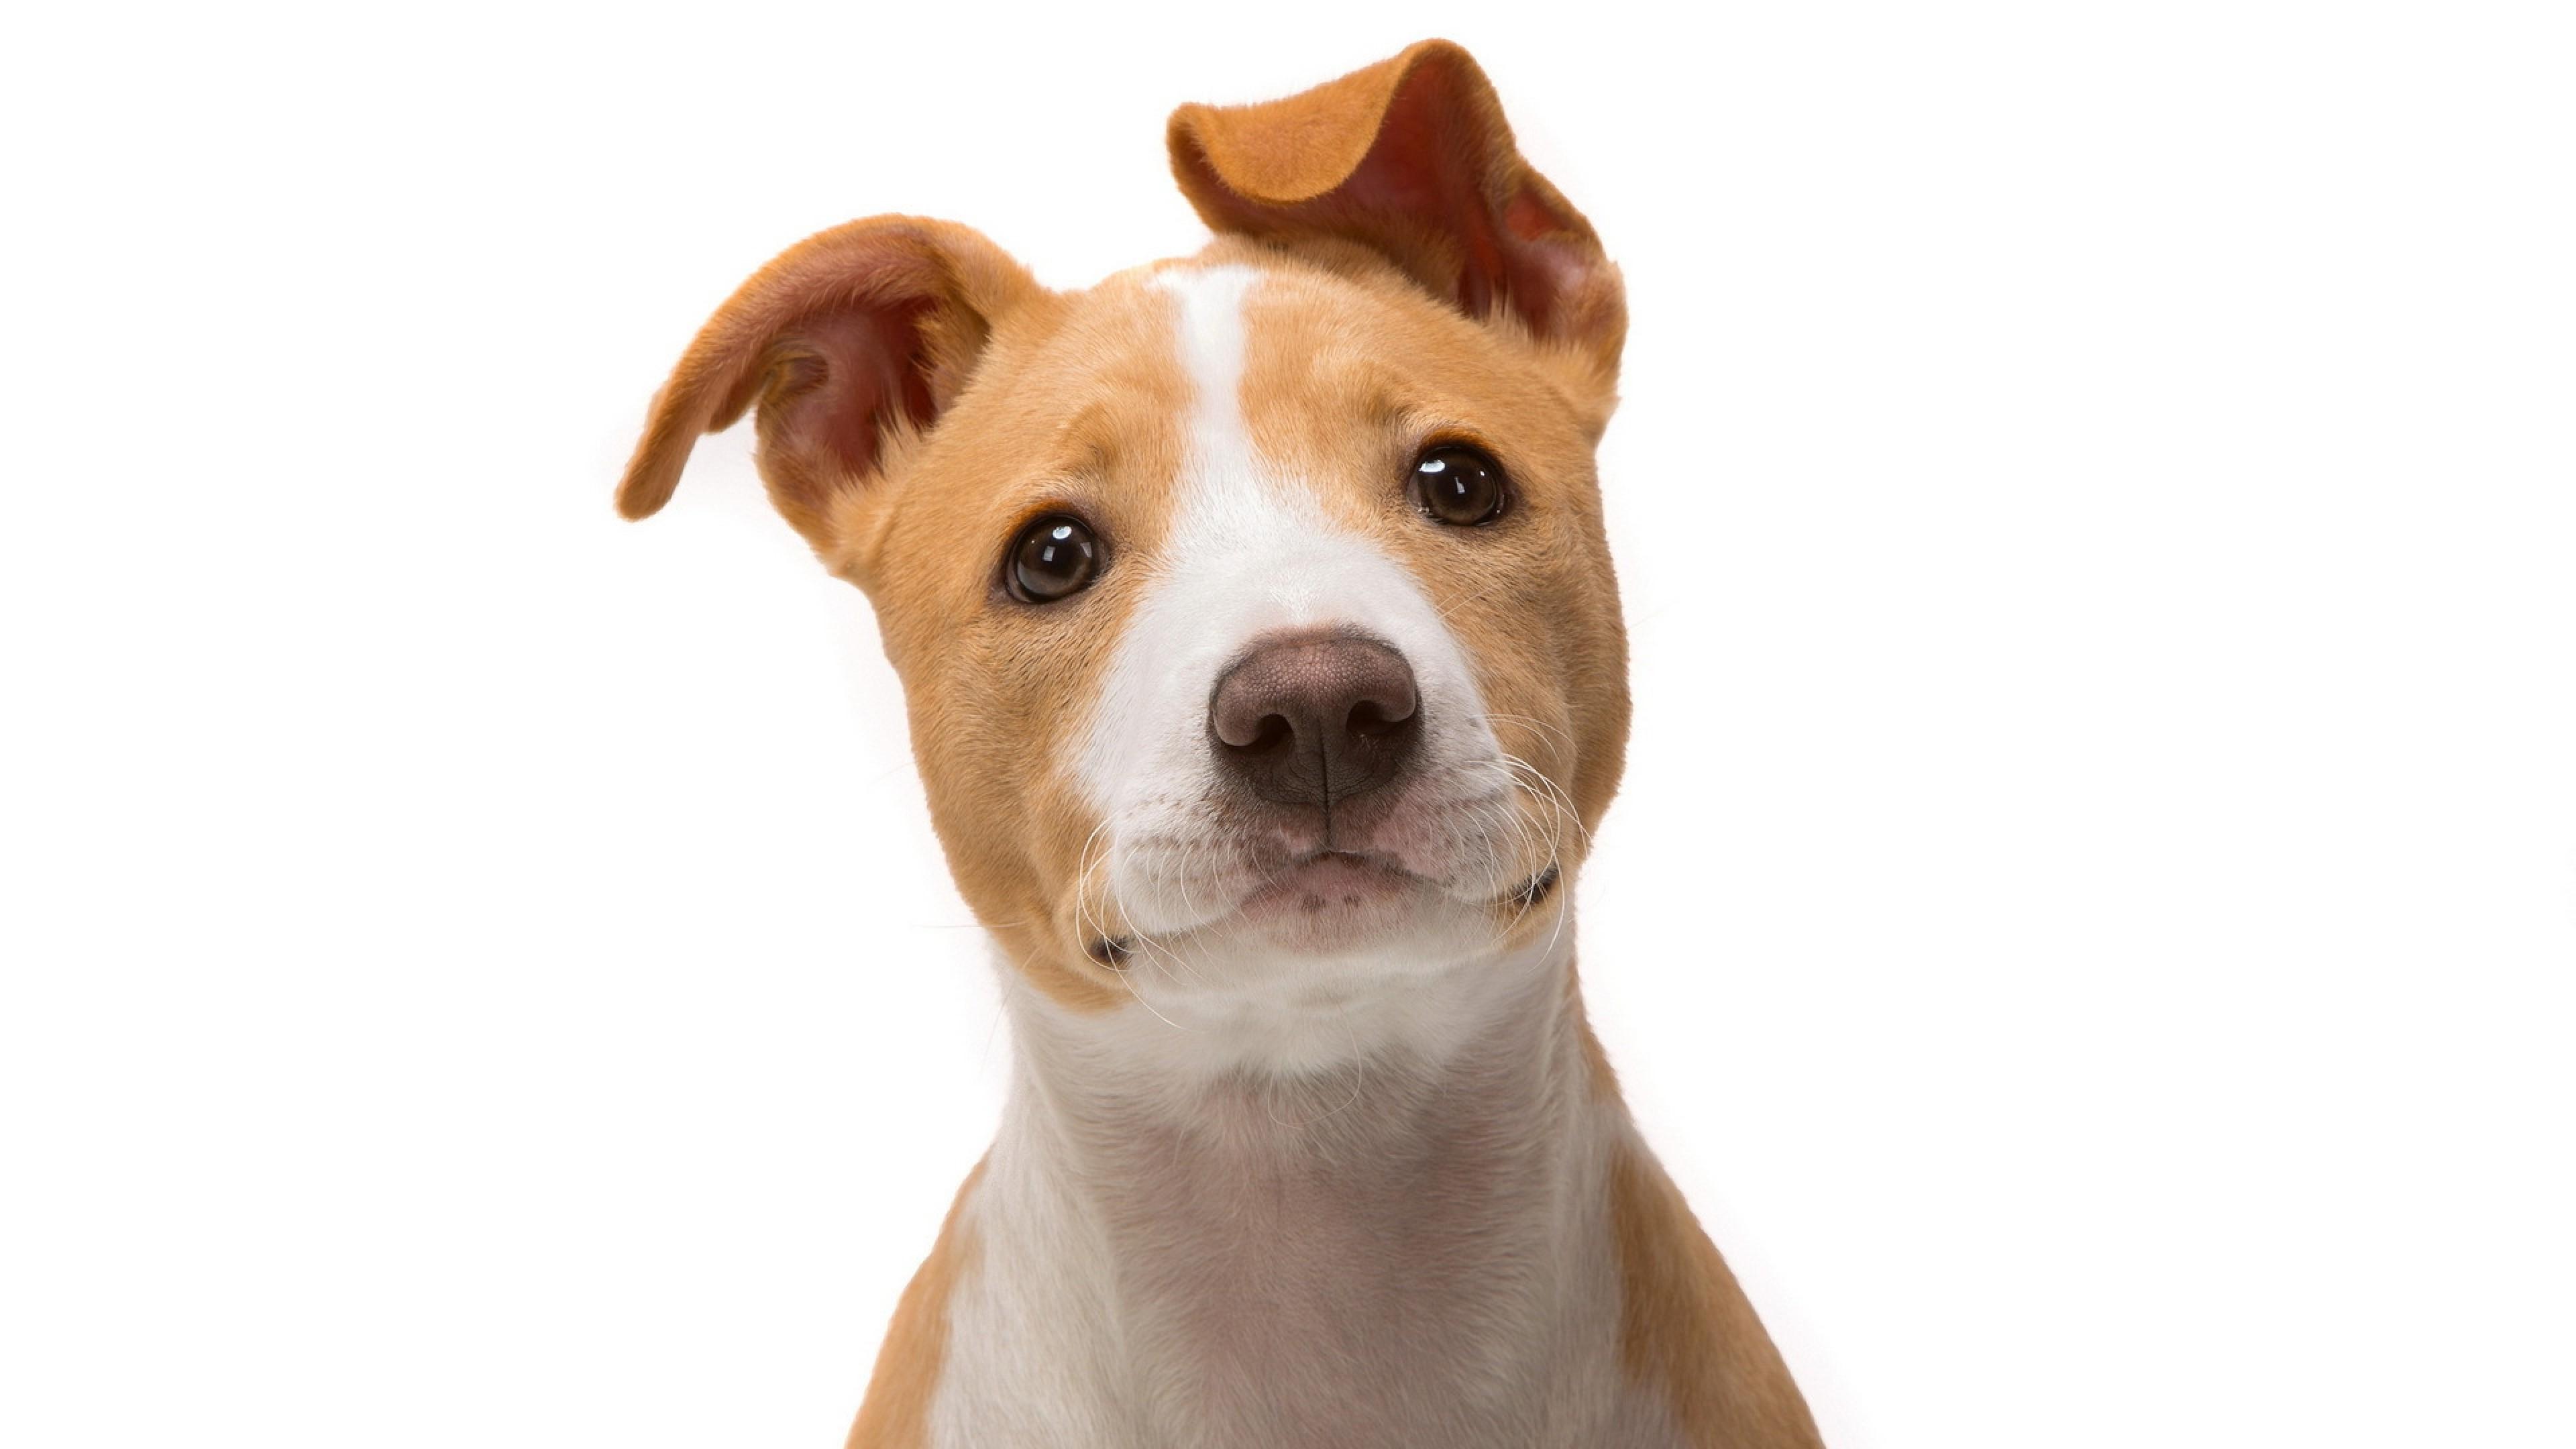 jack russell terrier 4k 1542237711 - Jack Russell Terrier 4k - pug wallpapers, jack russell terrier wallpapers, dog wallpapers, animals wallpapers